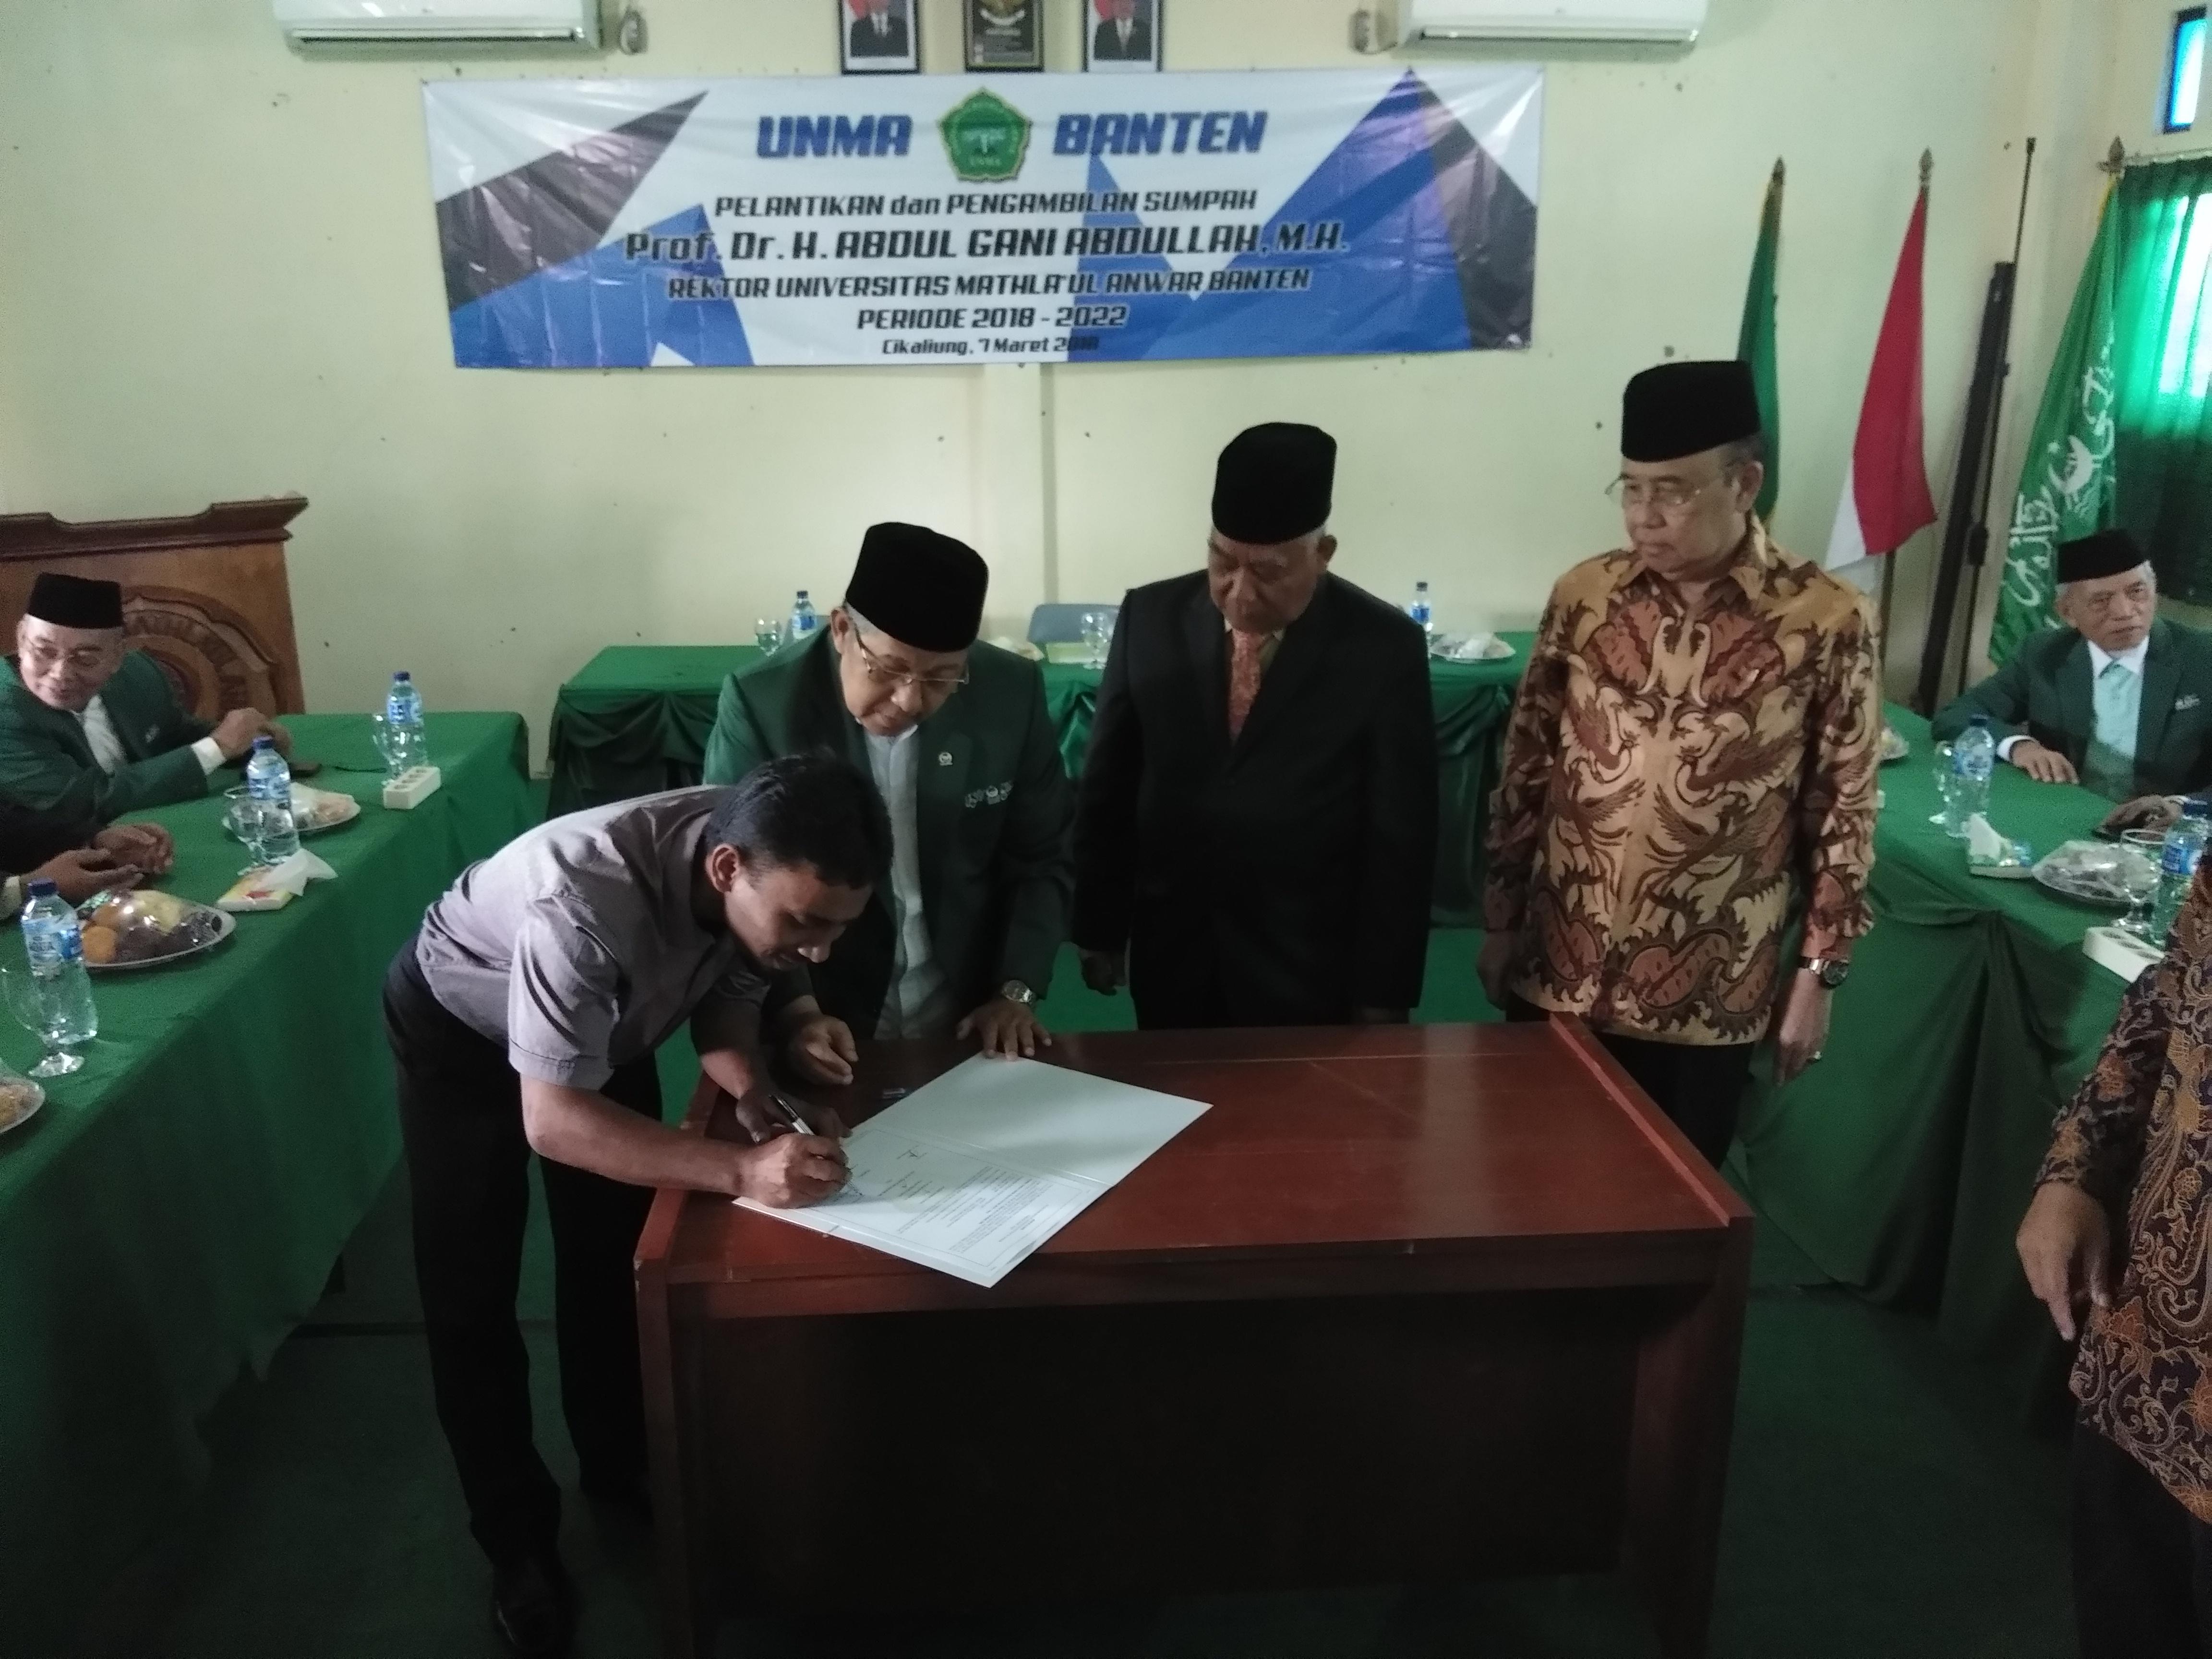 Pelantikan Rektor Baru UNMA Banten